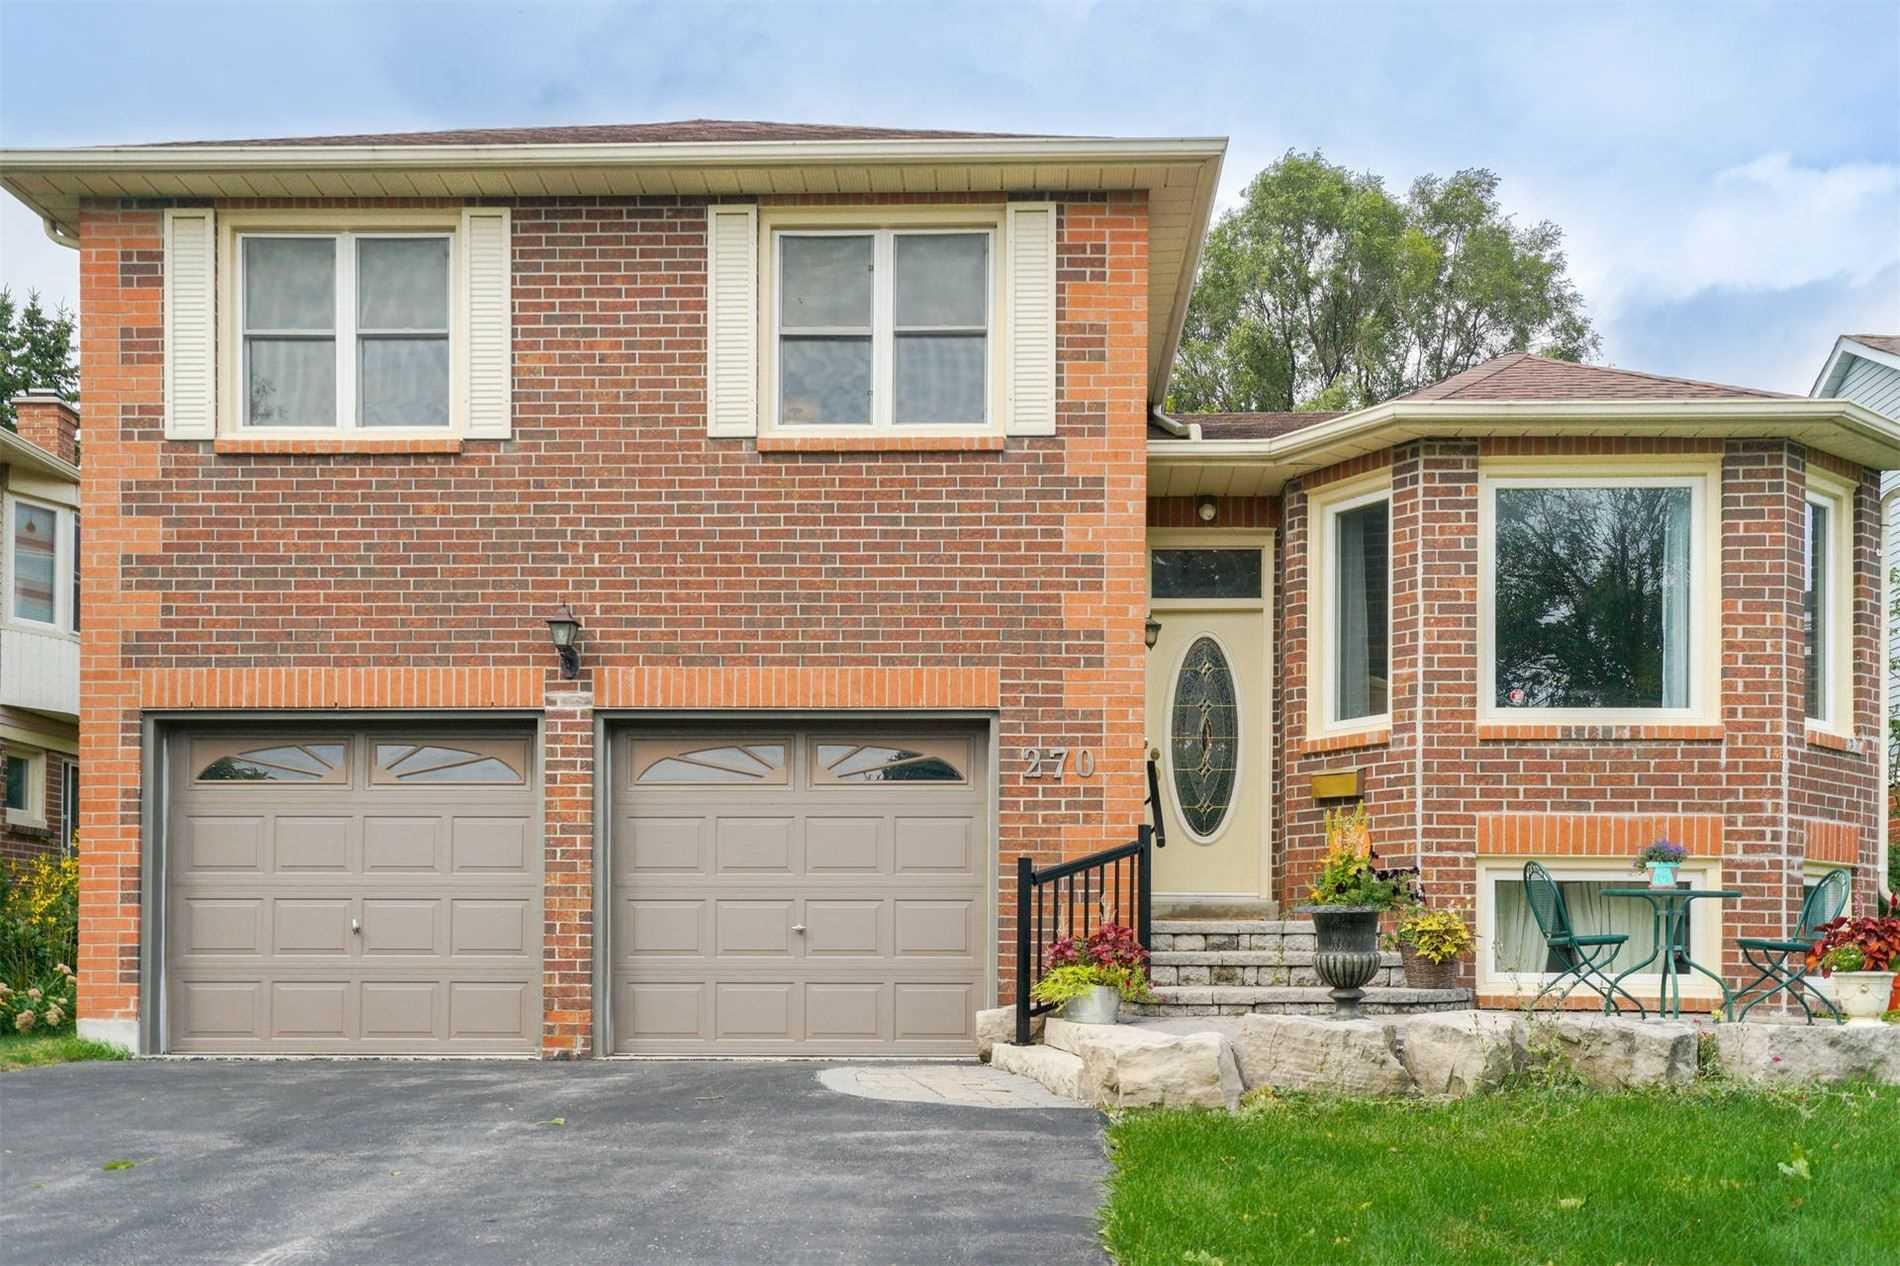 270 Glenway Circ, Newmarket, Ontario L3Y7S7, 3 Bedrooms Bedrooms, 8 Rooms Rooms,4 BathroomsBathrooms,Detached,For Sale,Glenway,N4905746